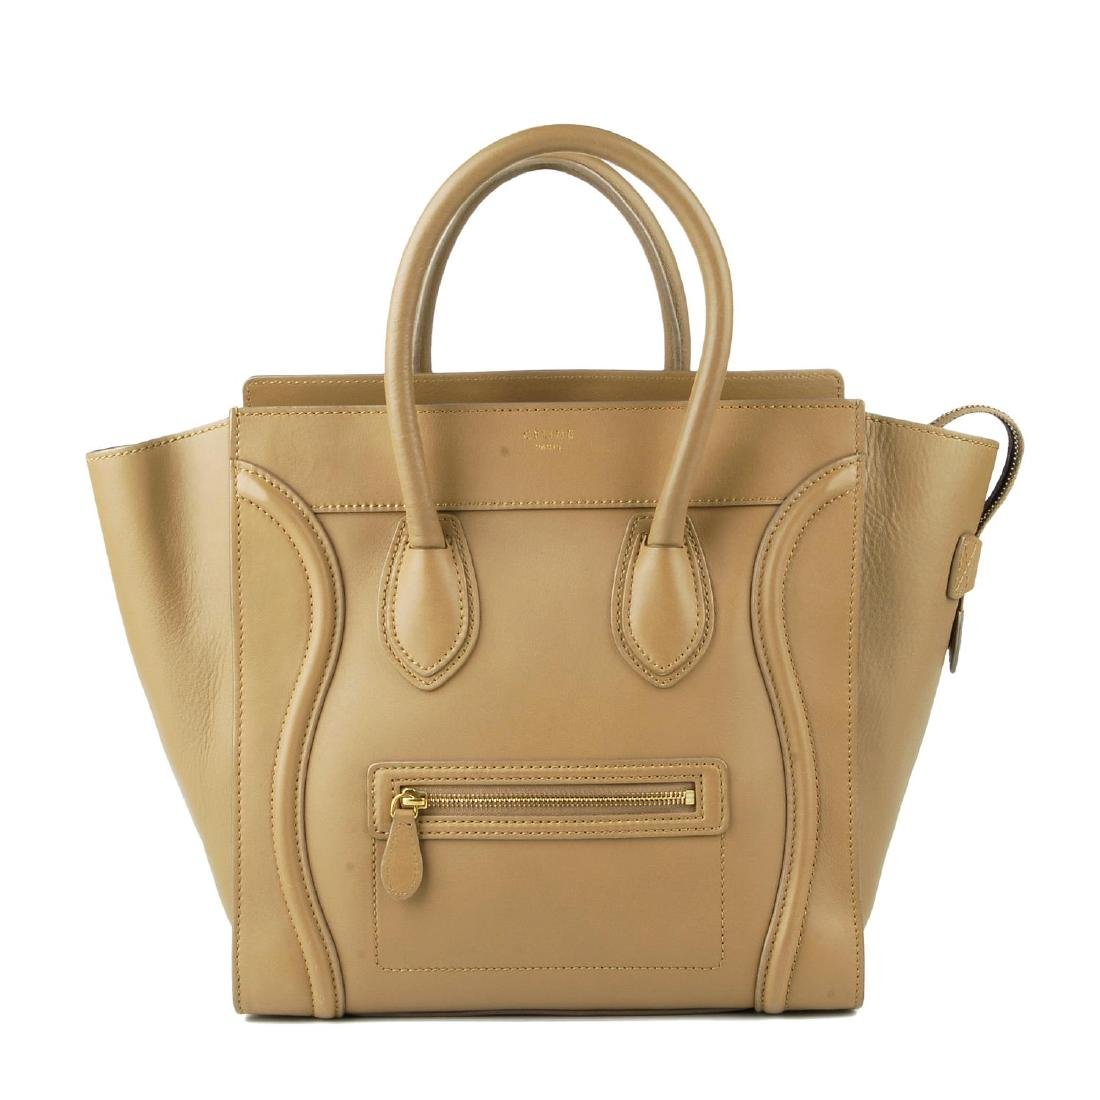 CÉLINE - a taupe Mini Luggage handbag. Designed with a